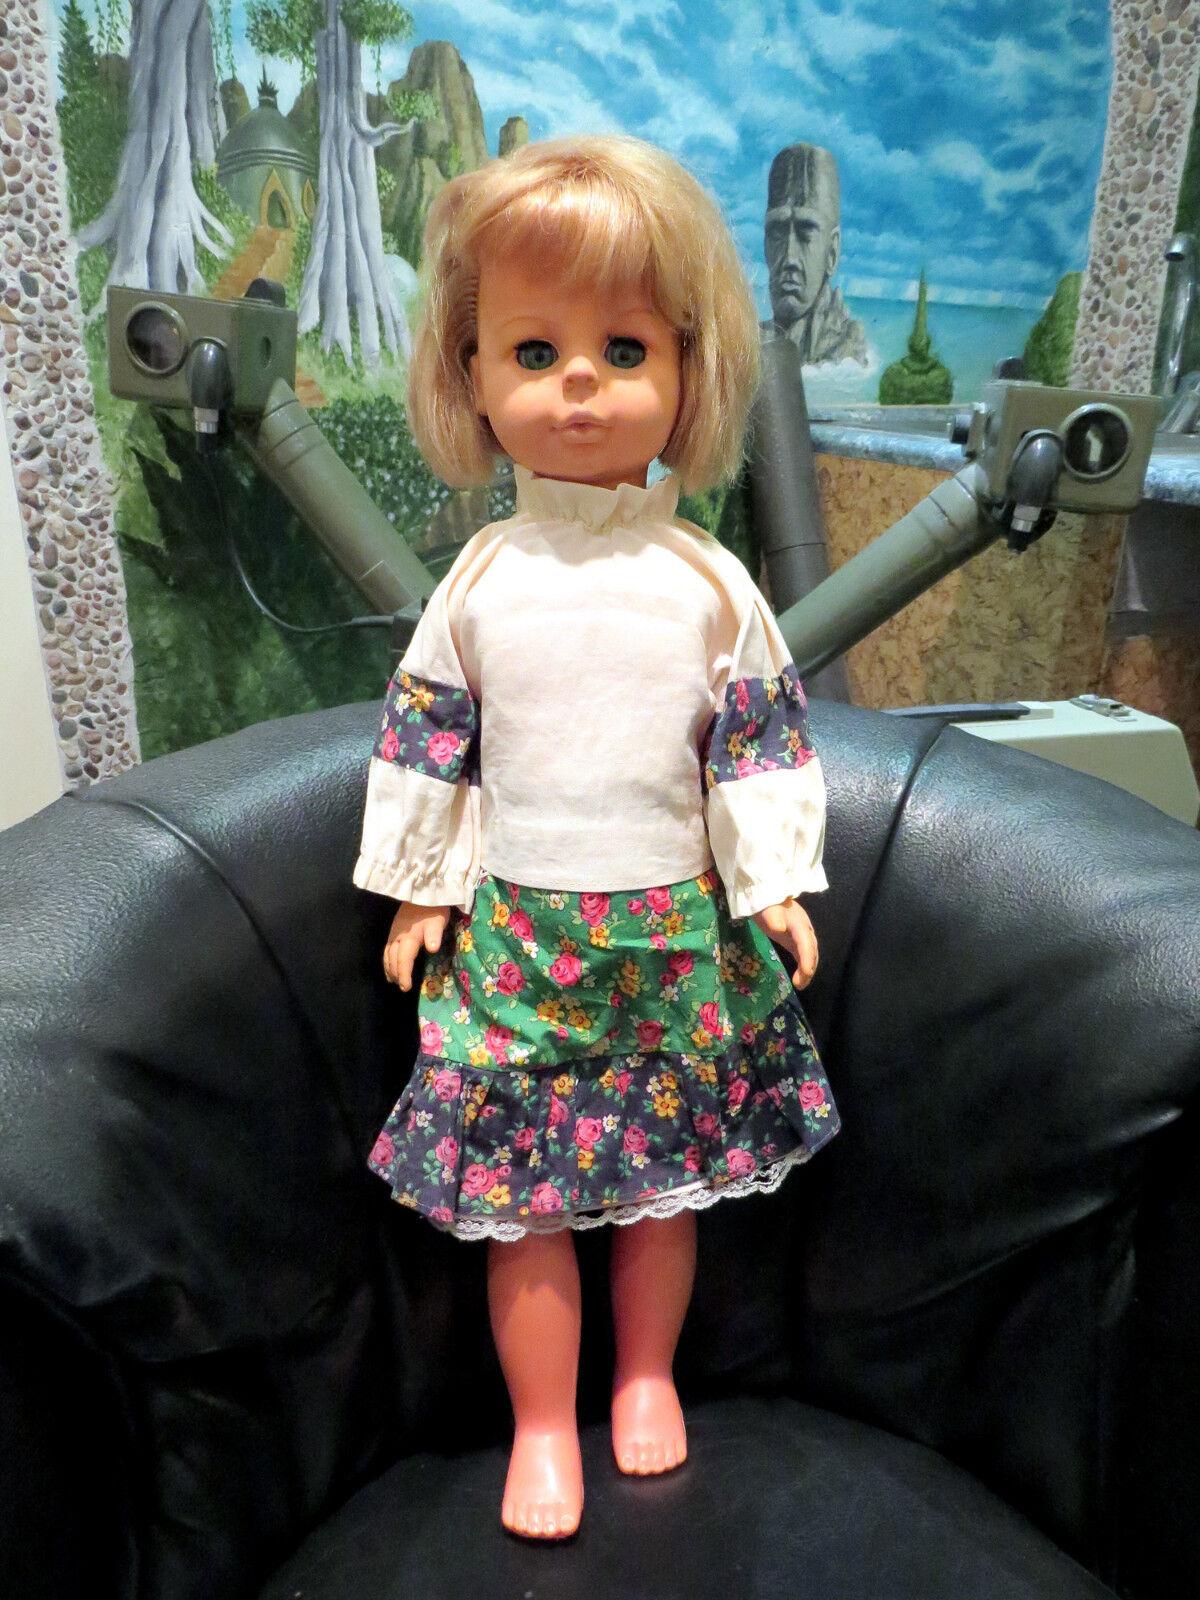 24 24 24  Vintage Muñeca Bebé Celuloide ruso cerrar los ojos para Niños Juguete Soviética Urss  mejor oferta